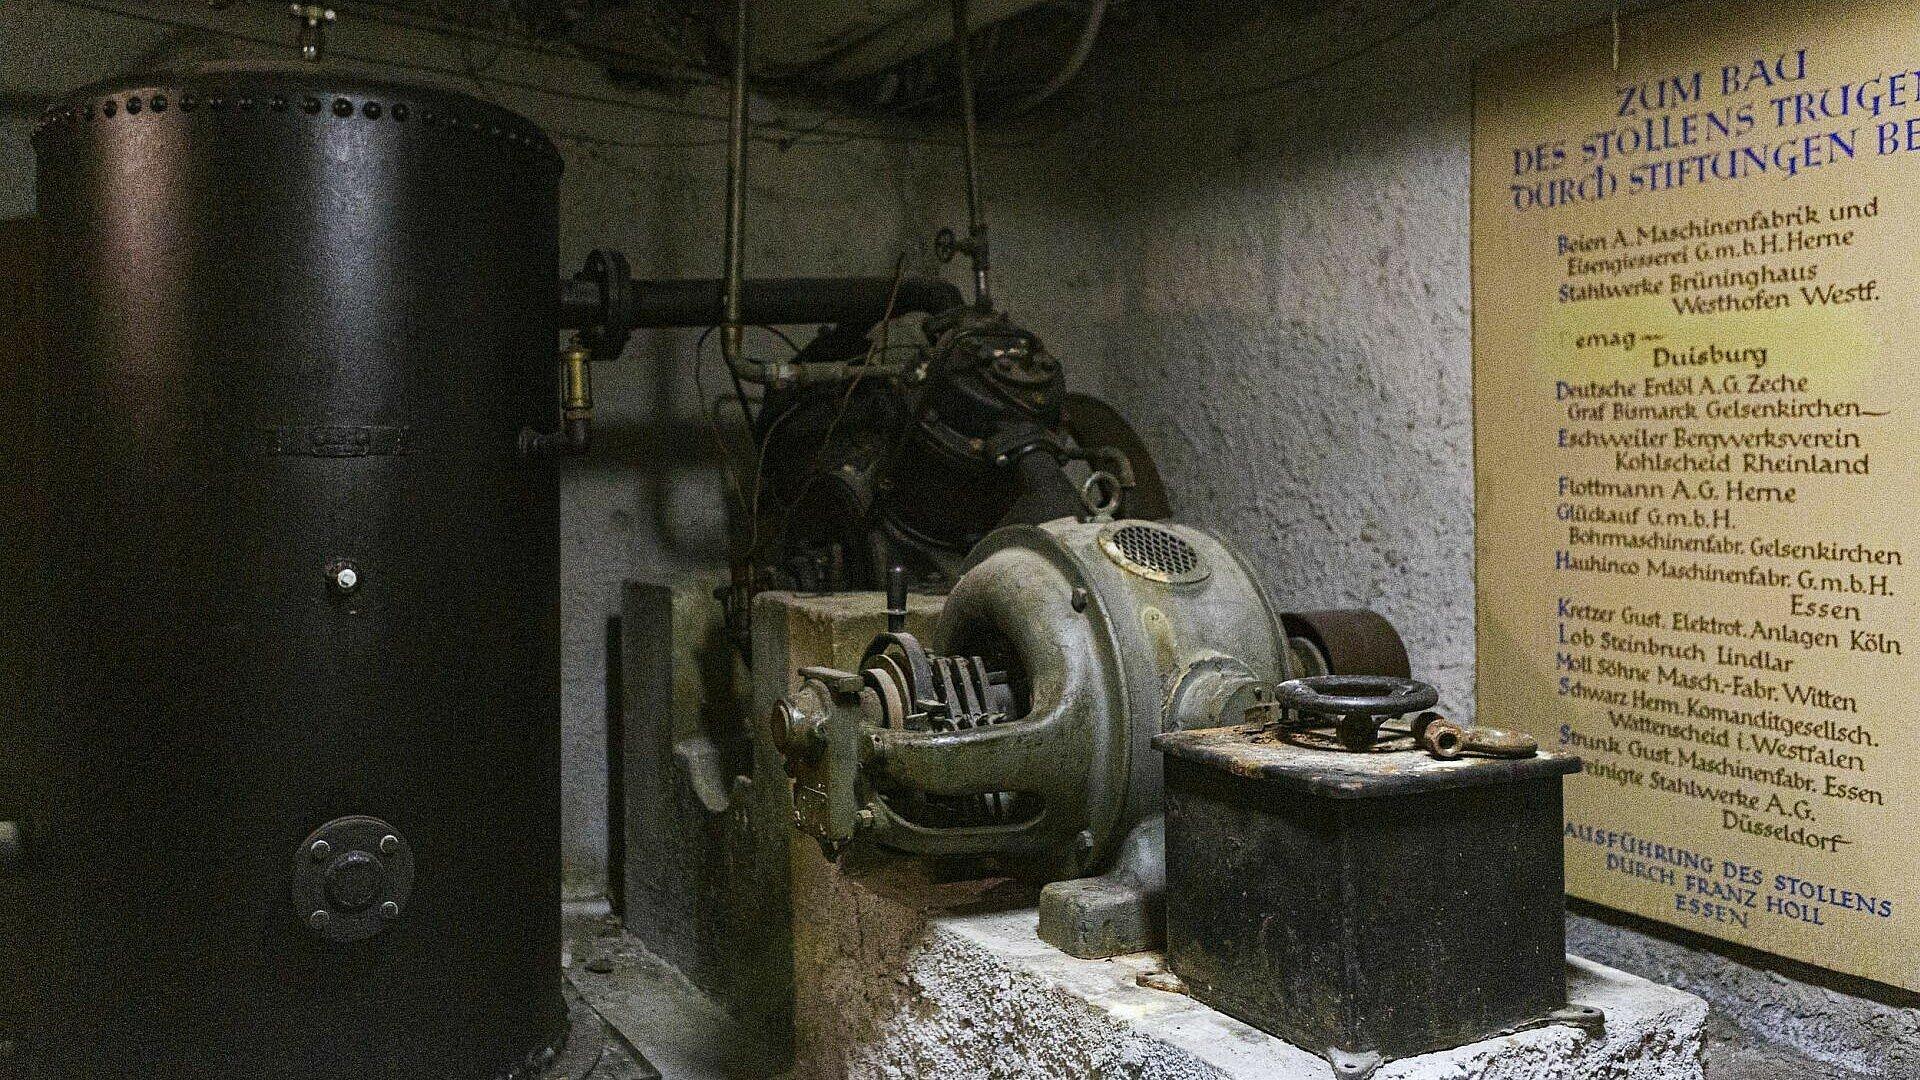 Pressluftkompressor im Barbarastollen in Köln